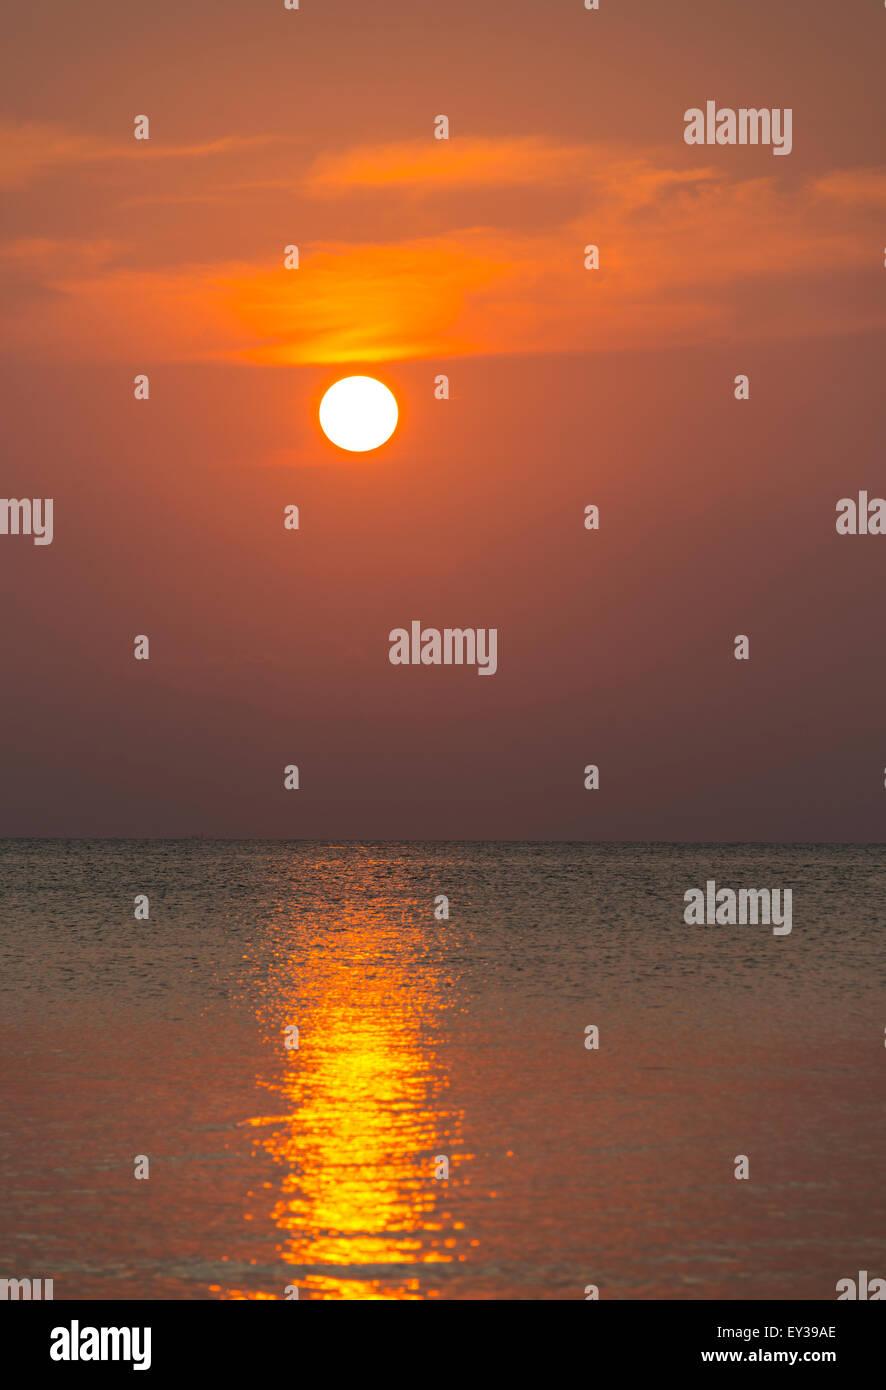 South China Sea at sunset, Gulf of Thailand, Koh Tao island, Thailand - Stock Image